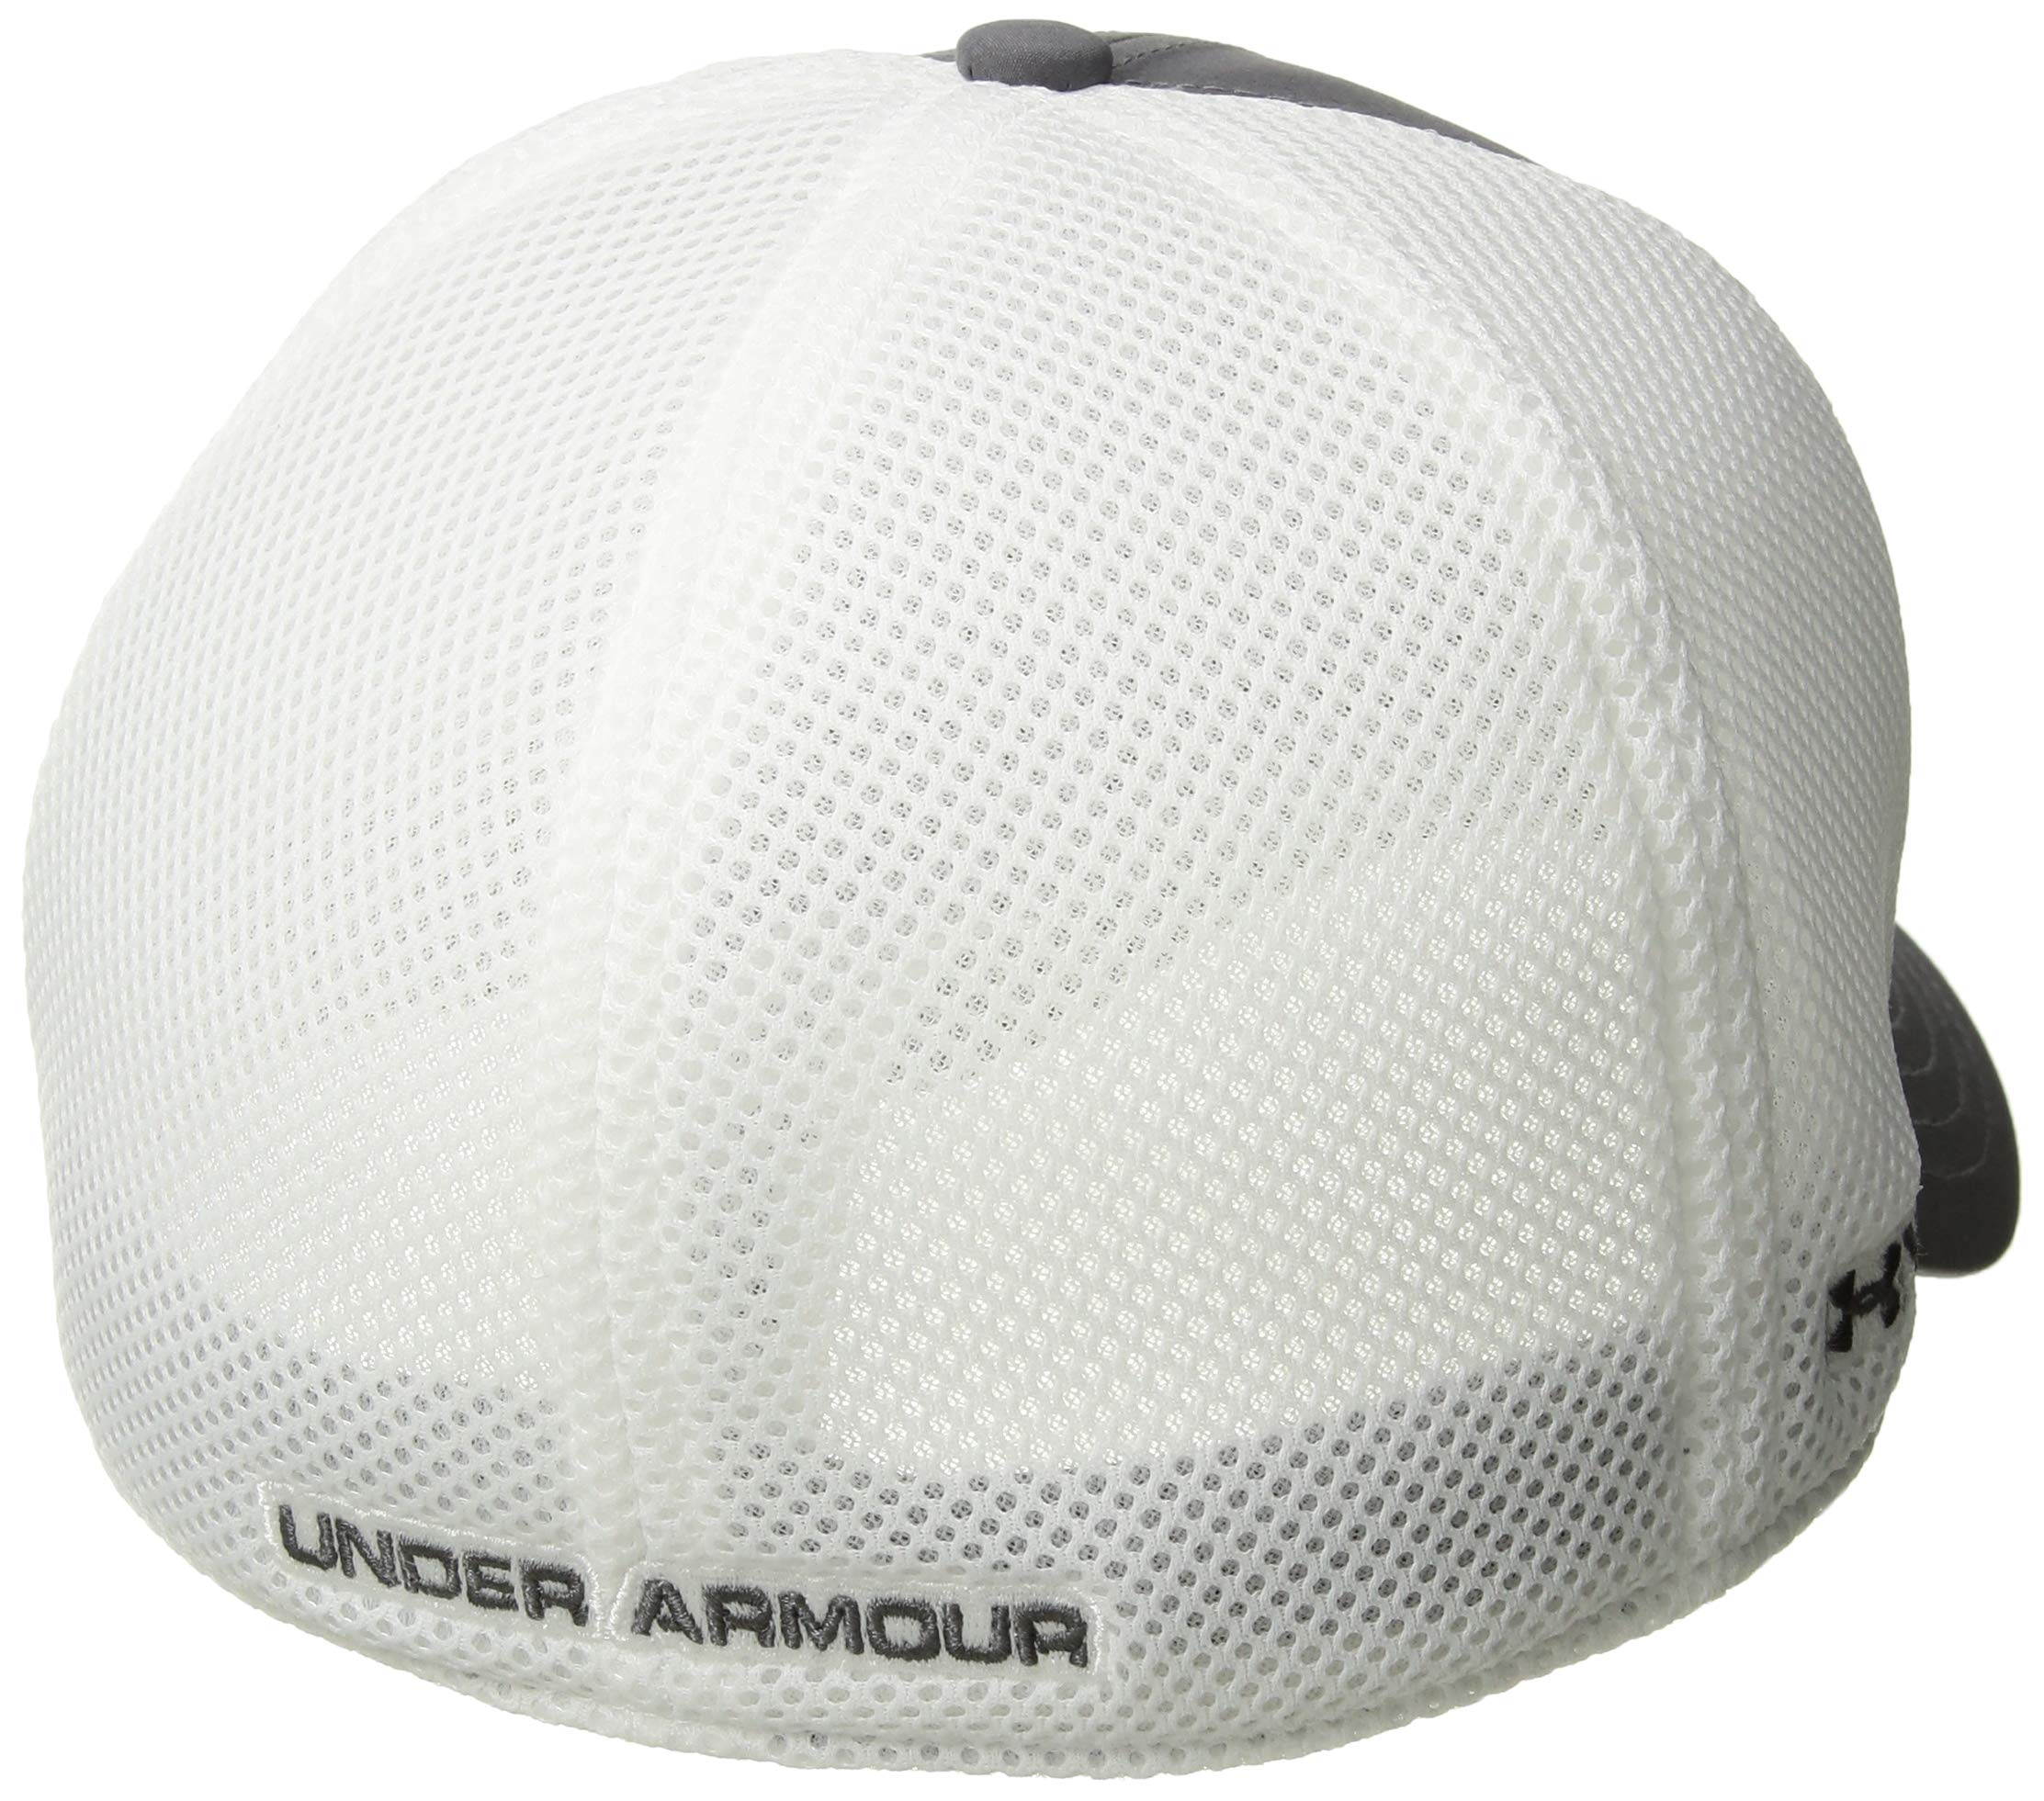 90ae47c5a77 Under Armour Men s Microthread Golf Mesh Cap - 1305017-588-P   Outdoor  Recreation   Sports   Outdoors - tibs